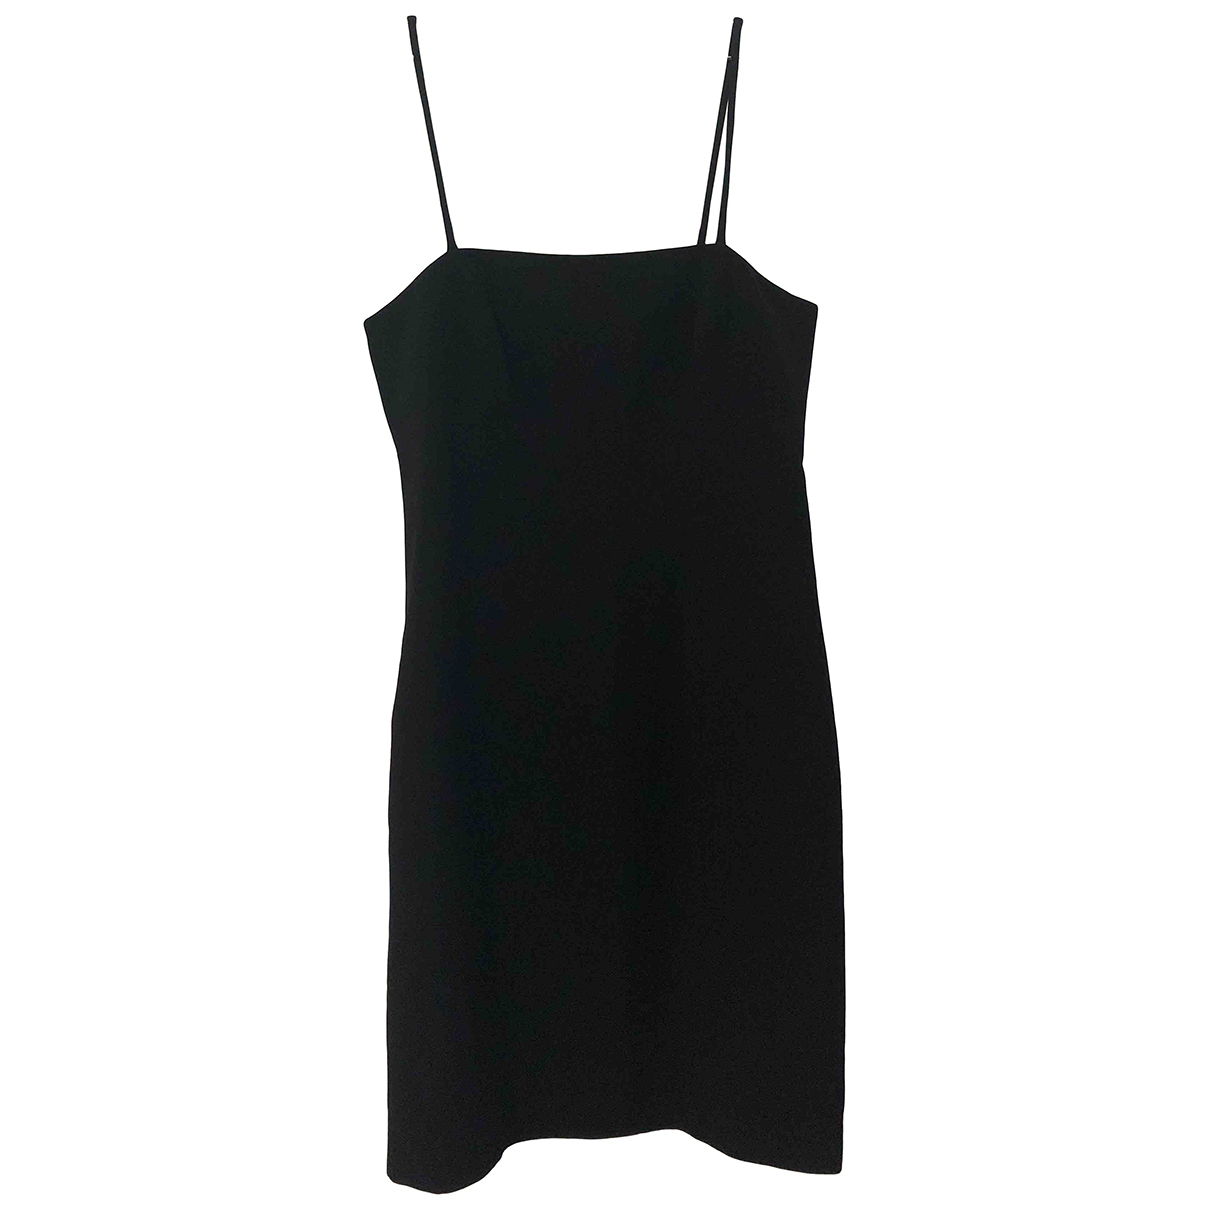 Gianfranco Ferré \N Black Cotton dress for Women 46 IT